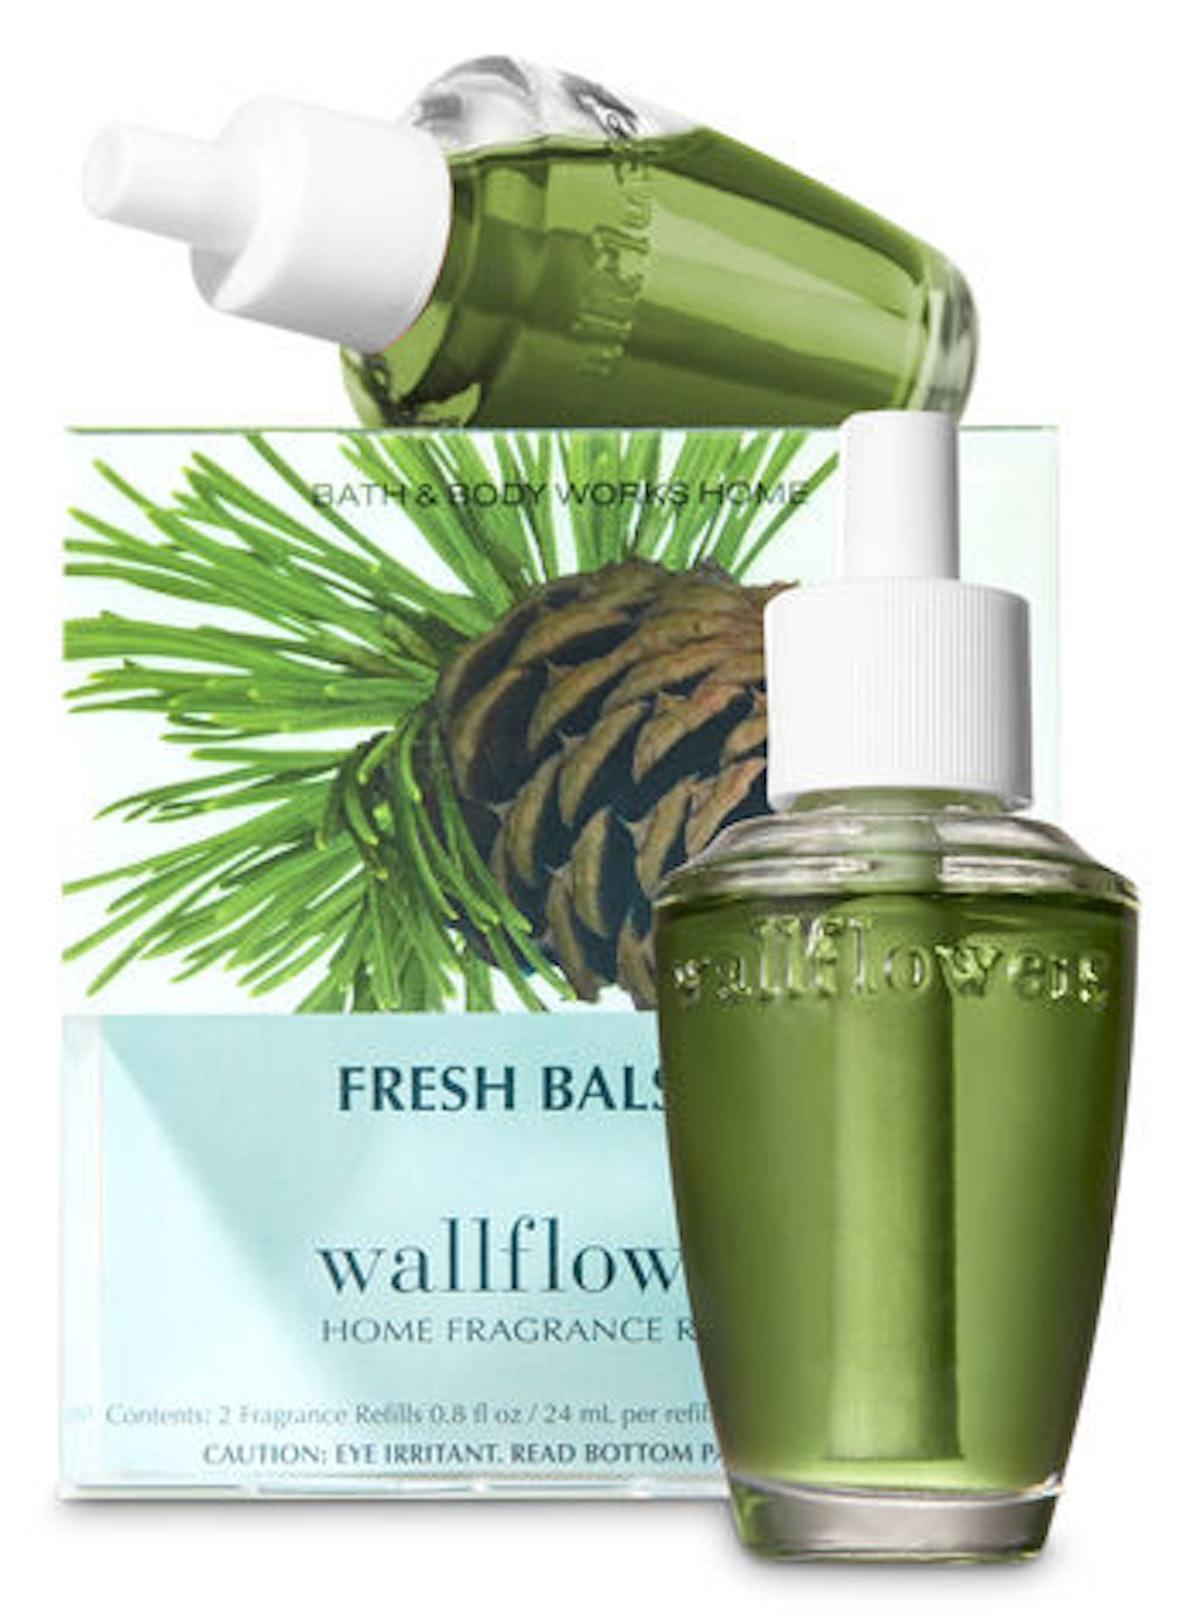 Fresh Balsam Wallflowers Refills Two-Pack